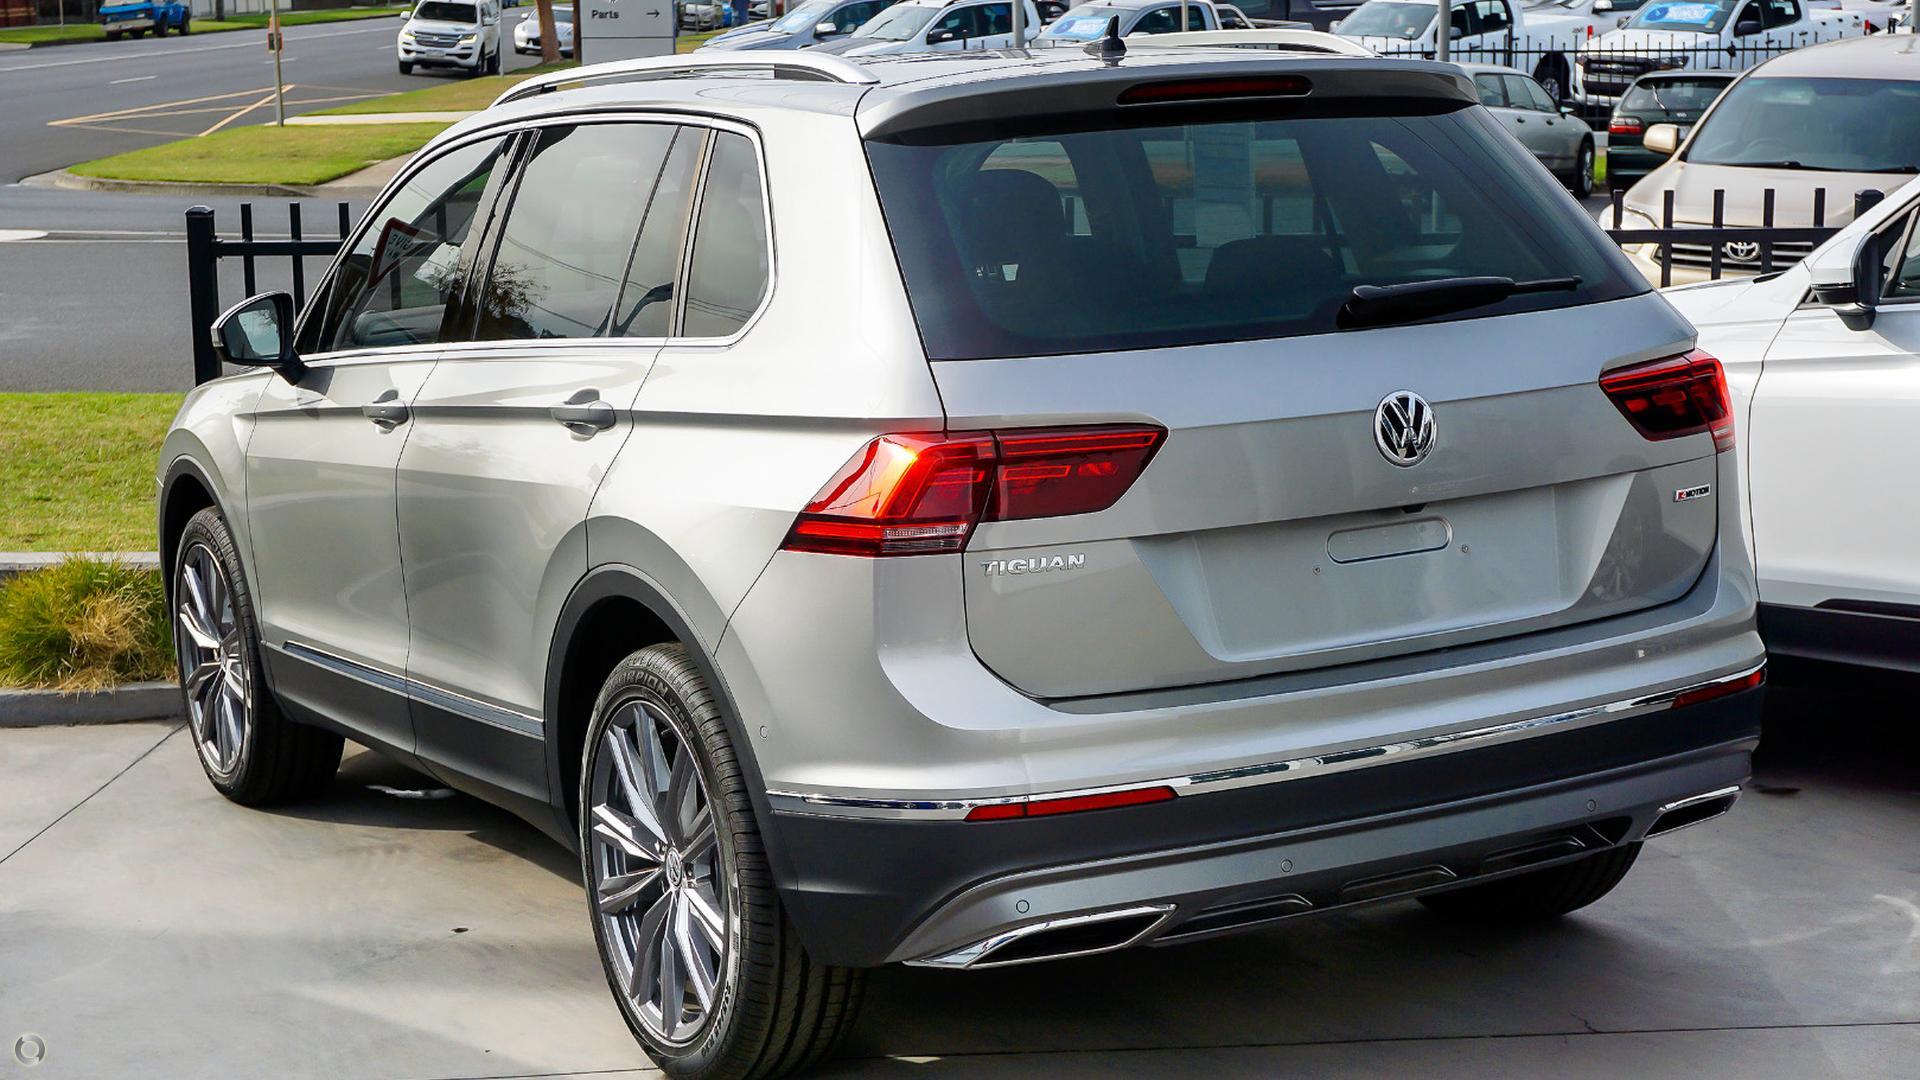 2017 Volkswagen Tiguan 162TSI Sportline 5N